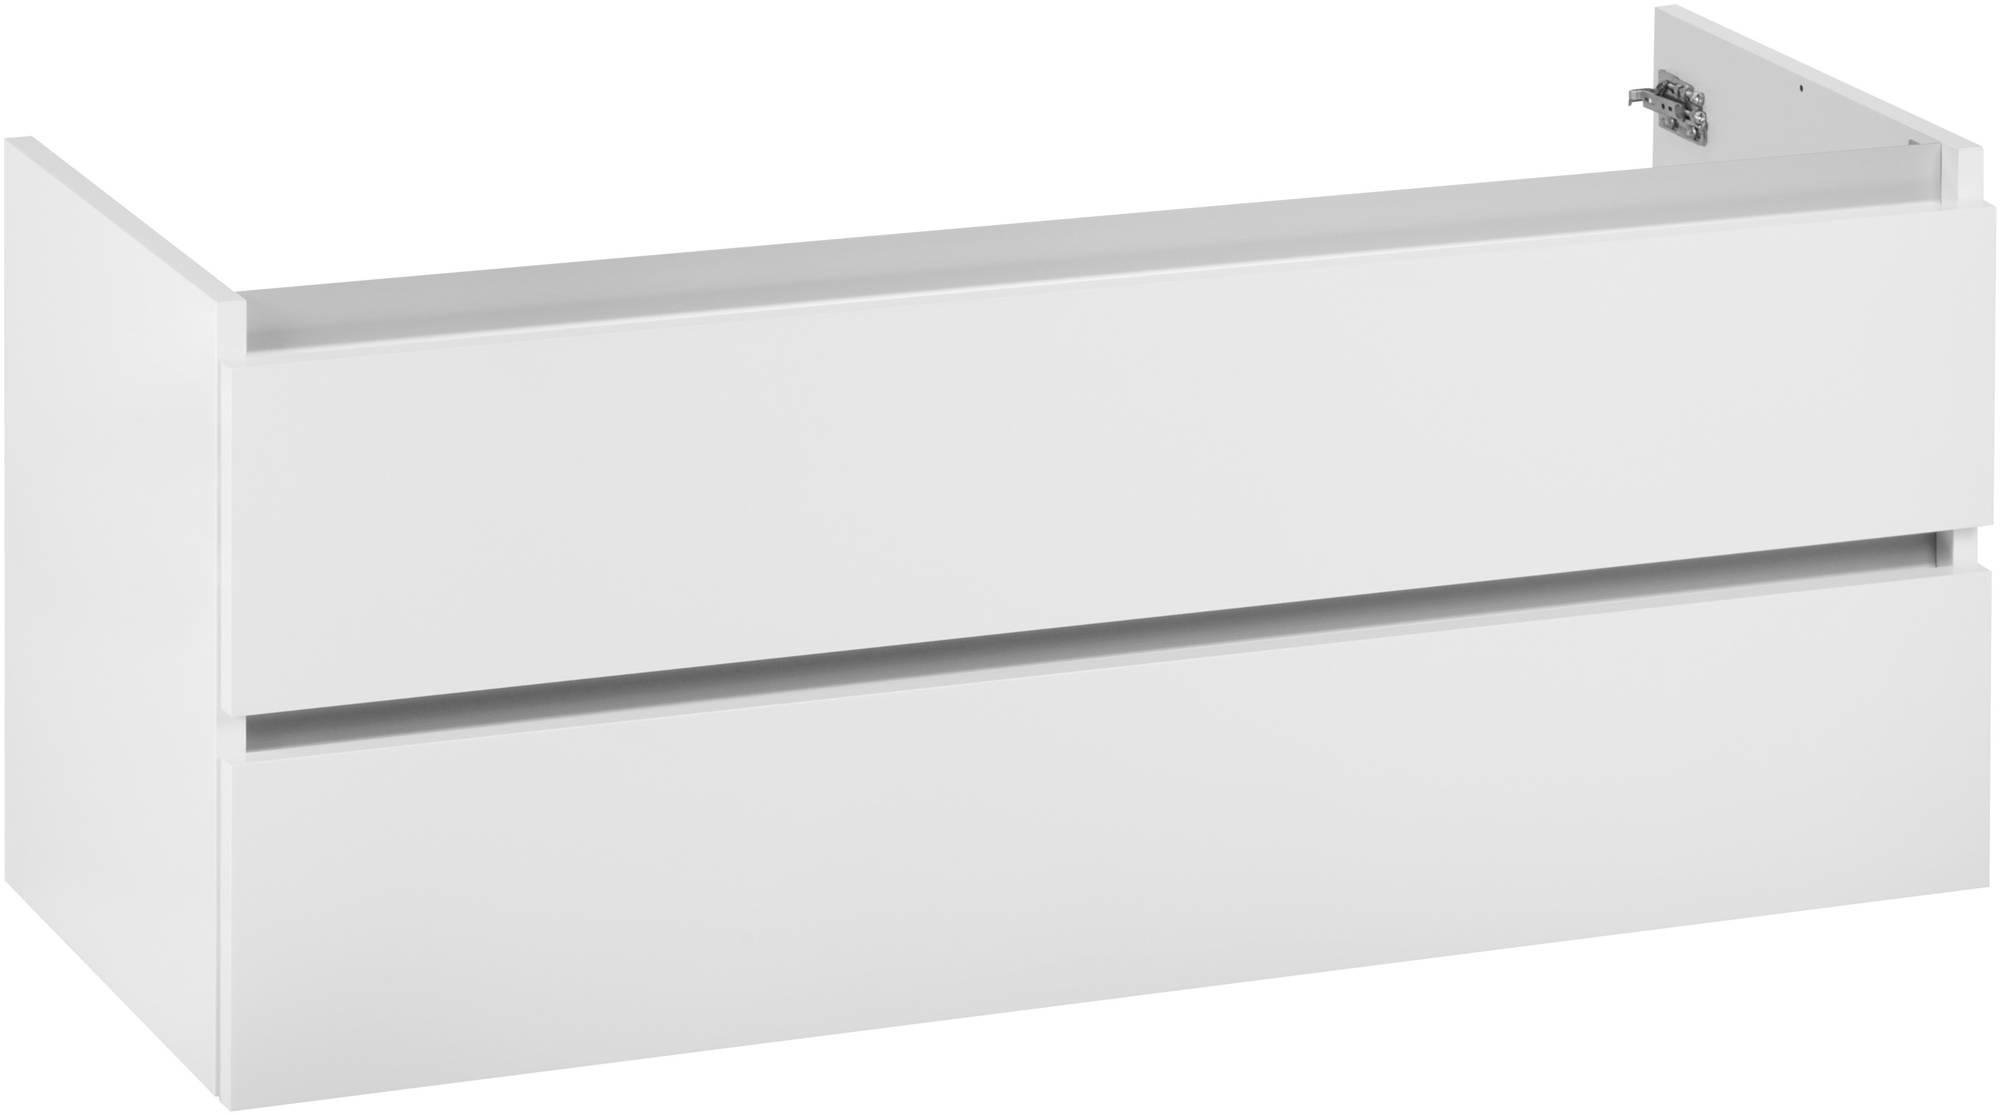 Ben Limara Wastafelonderkast 120x44,5x50cm Glans Wit/Aluminium